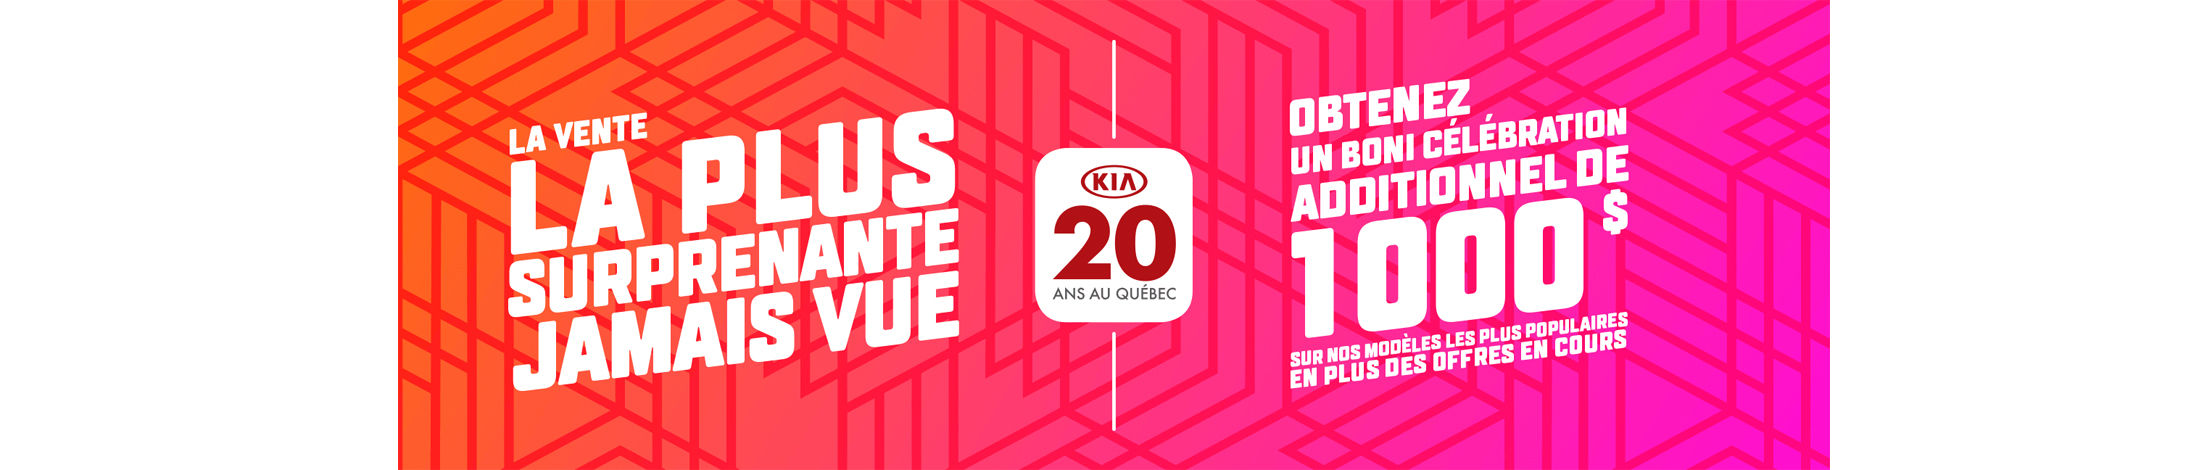 Kia Promotion mars banner